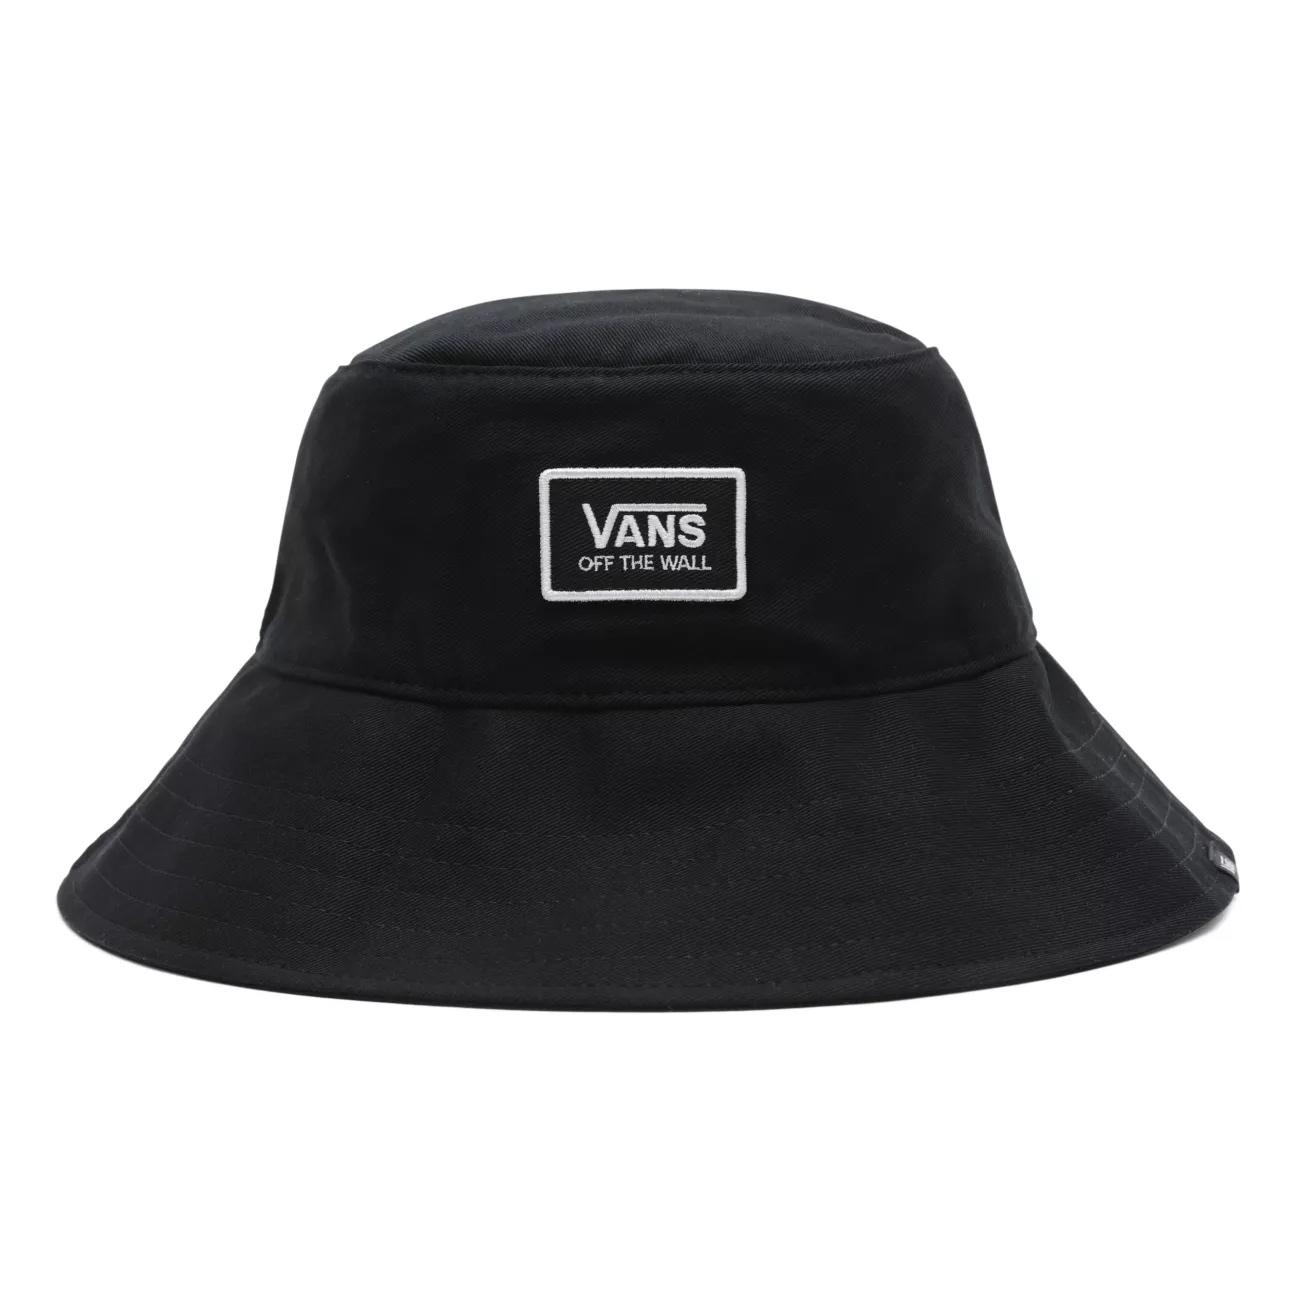 BOB VANS LEVEL UP BLACK